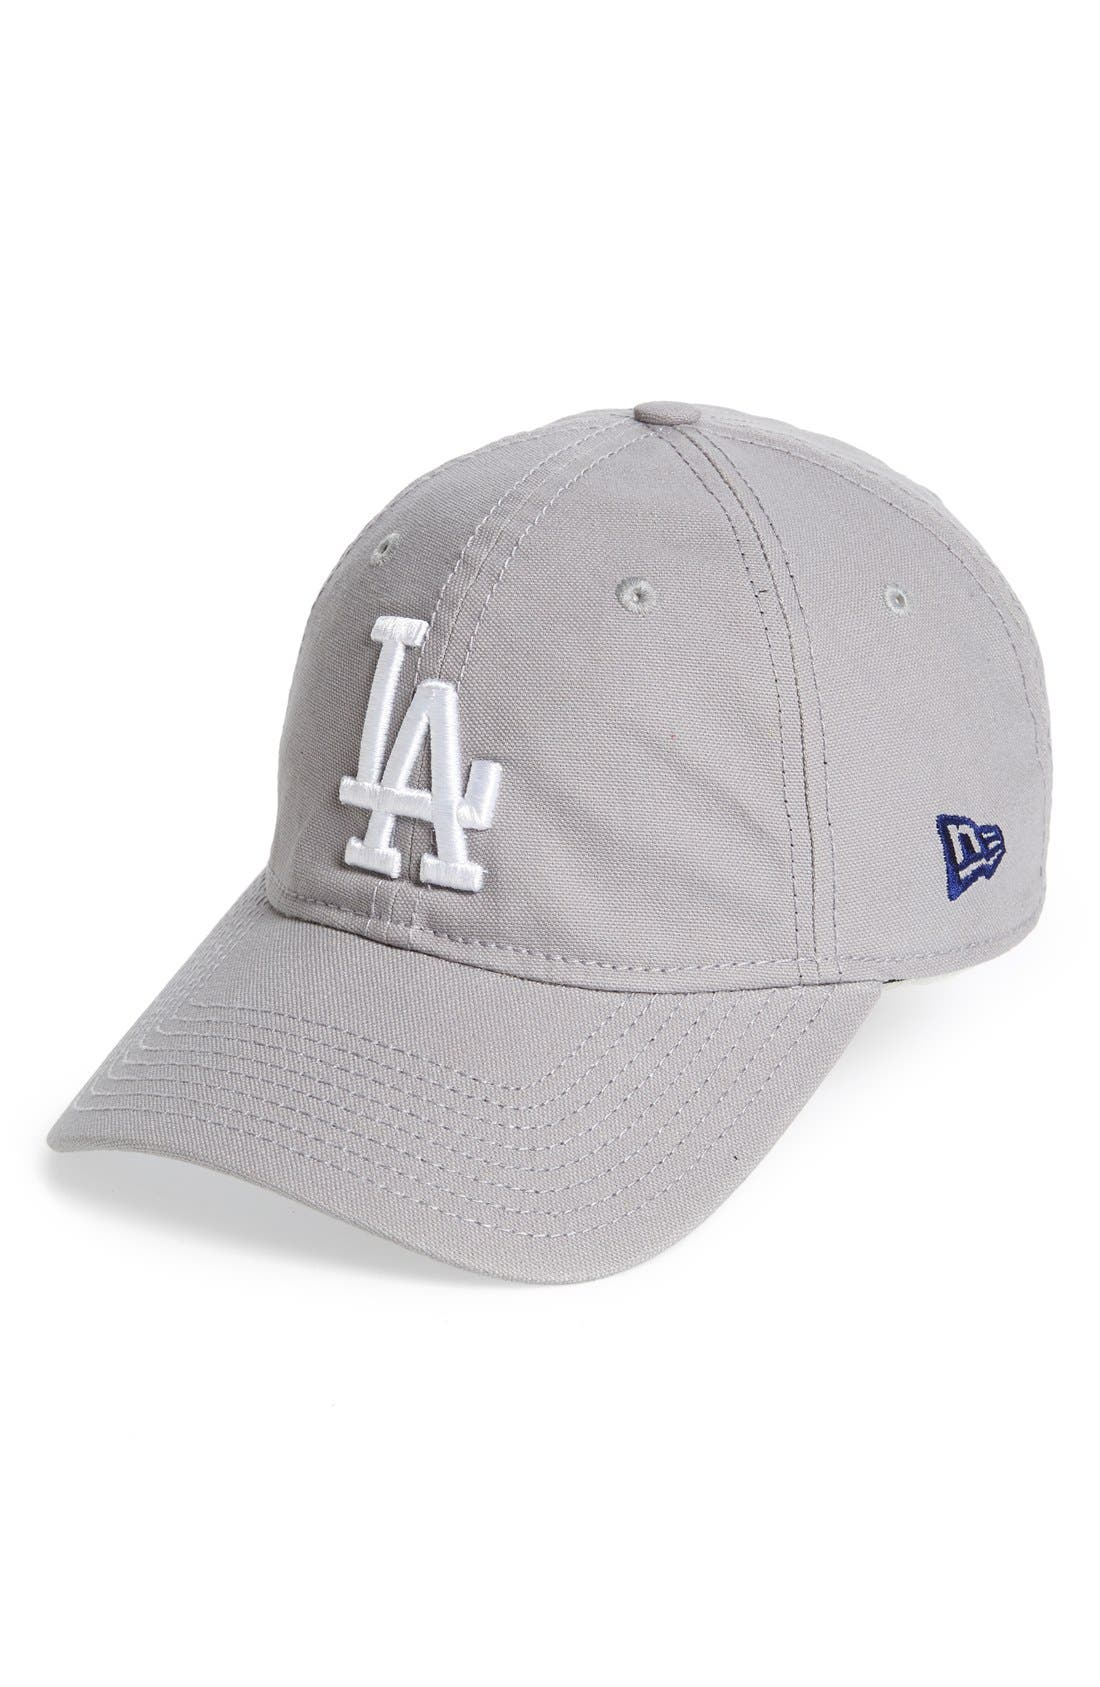 Alternate Image 1 Selected - New Era Cap 'Core Shore - Los Angeles Dodgers' Baseball Cap